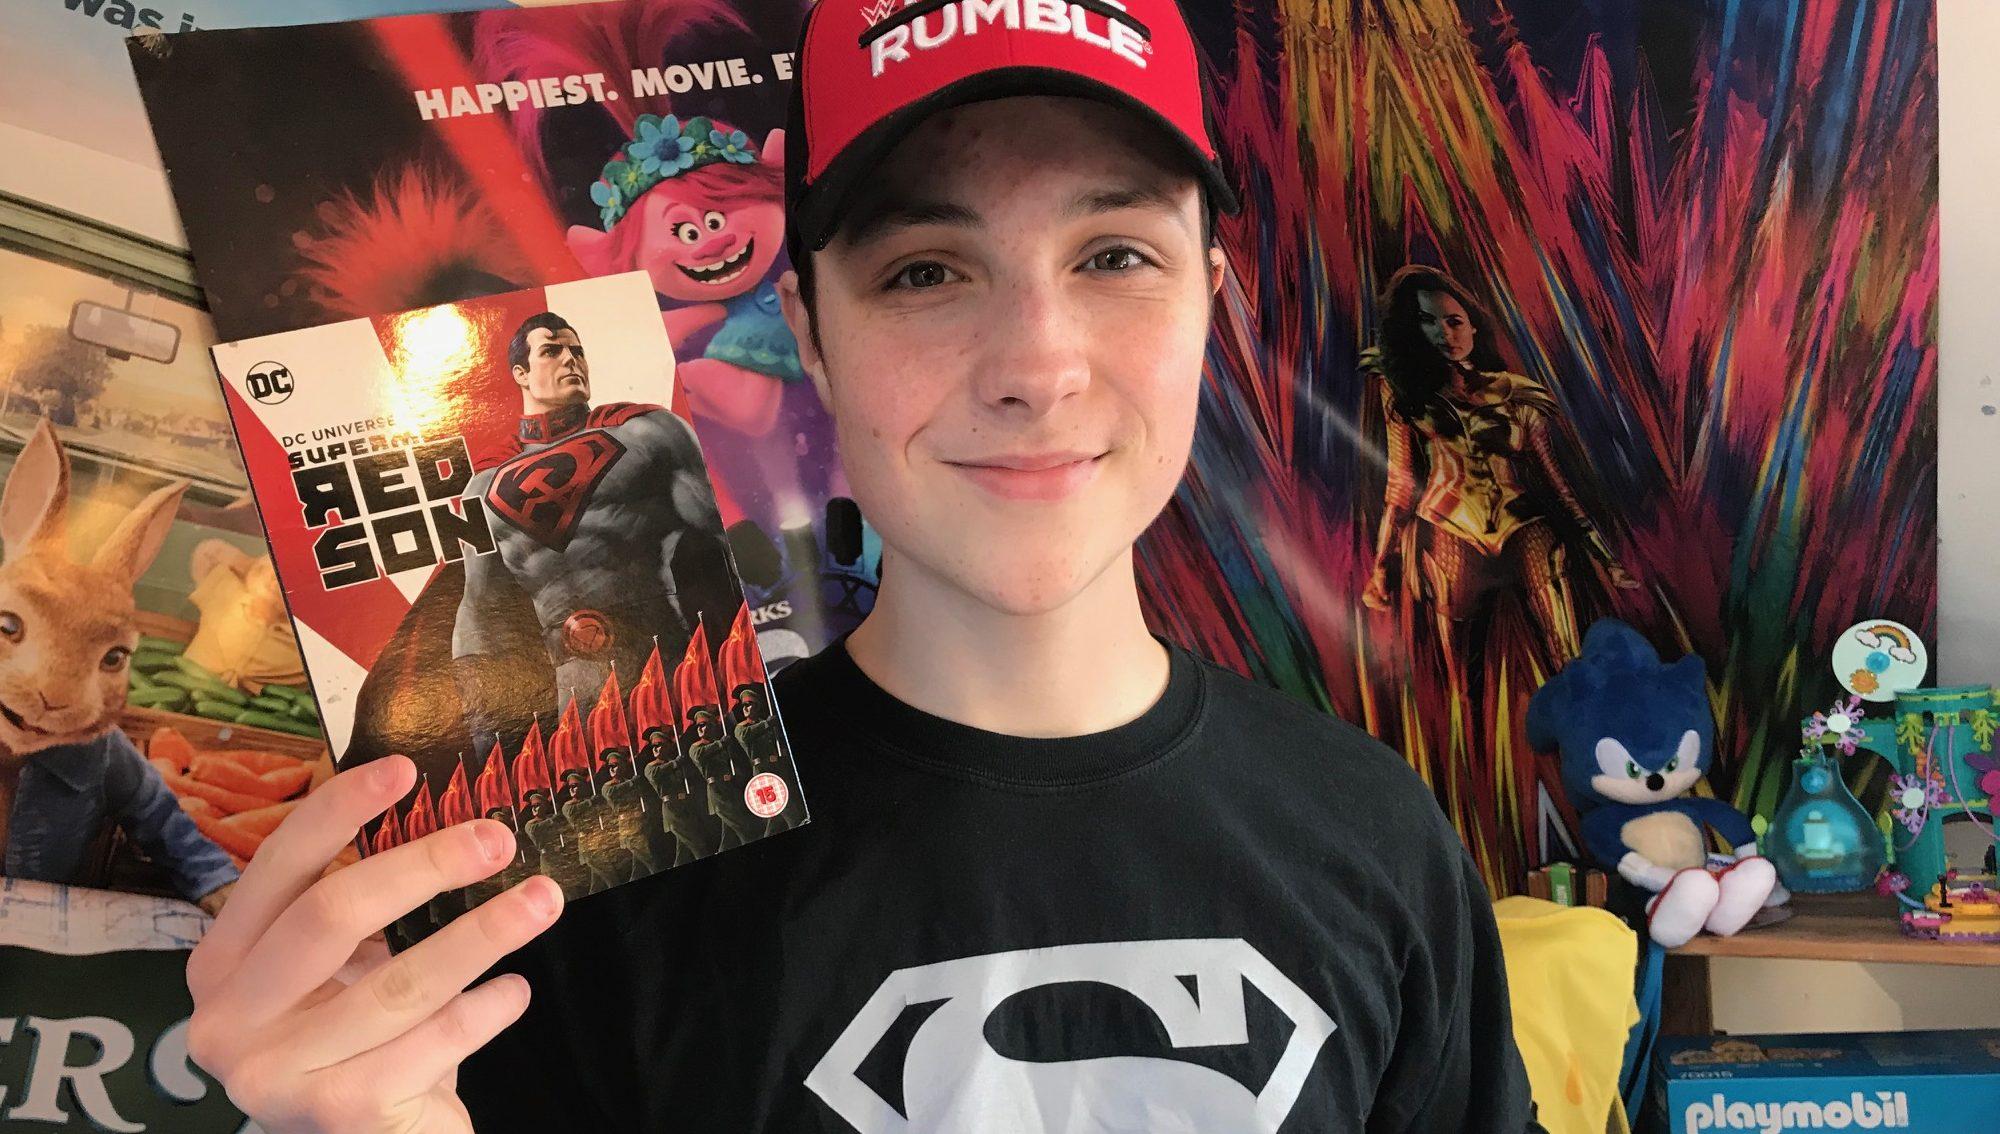 DC Comics – Superman Red Son